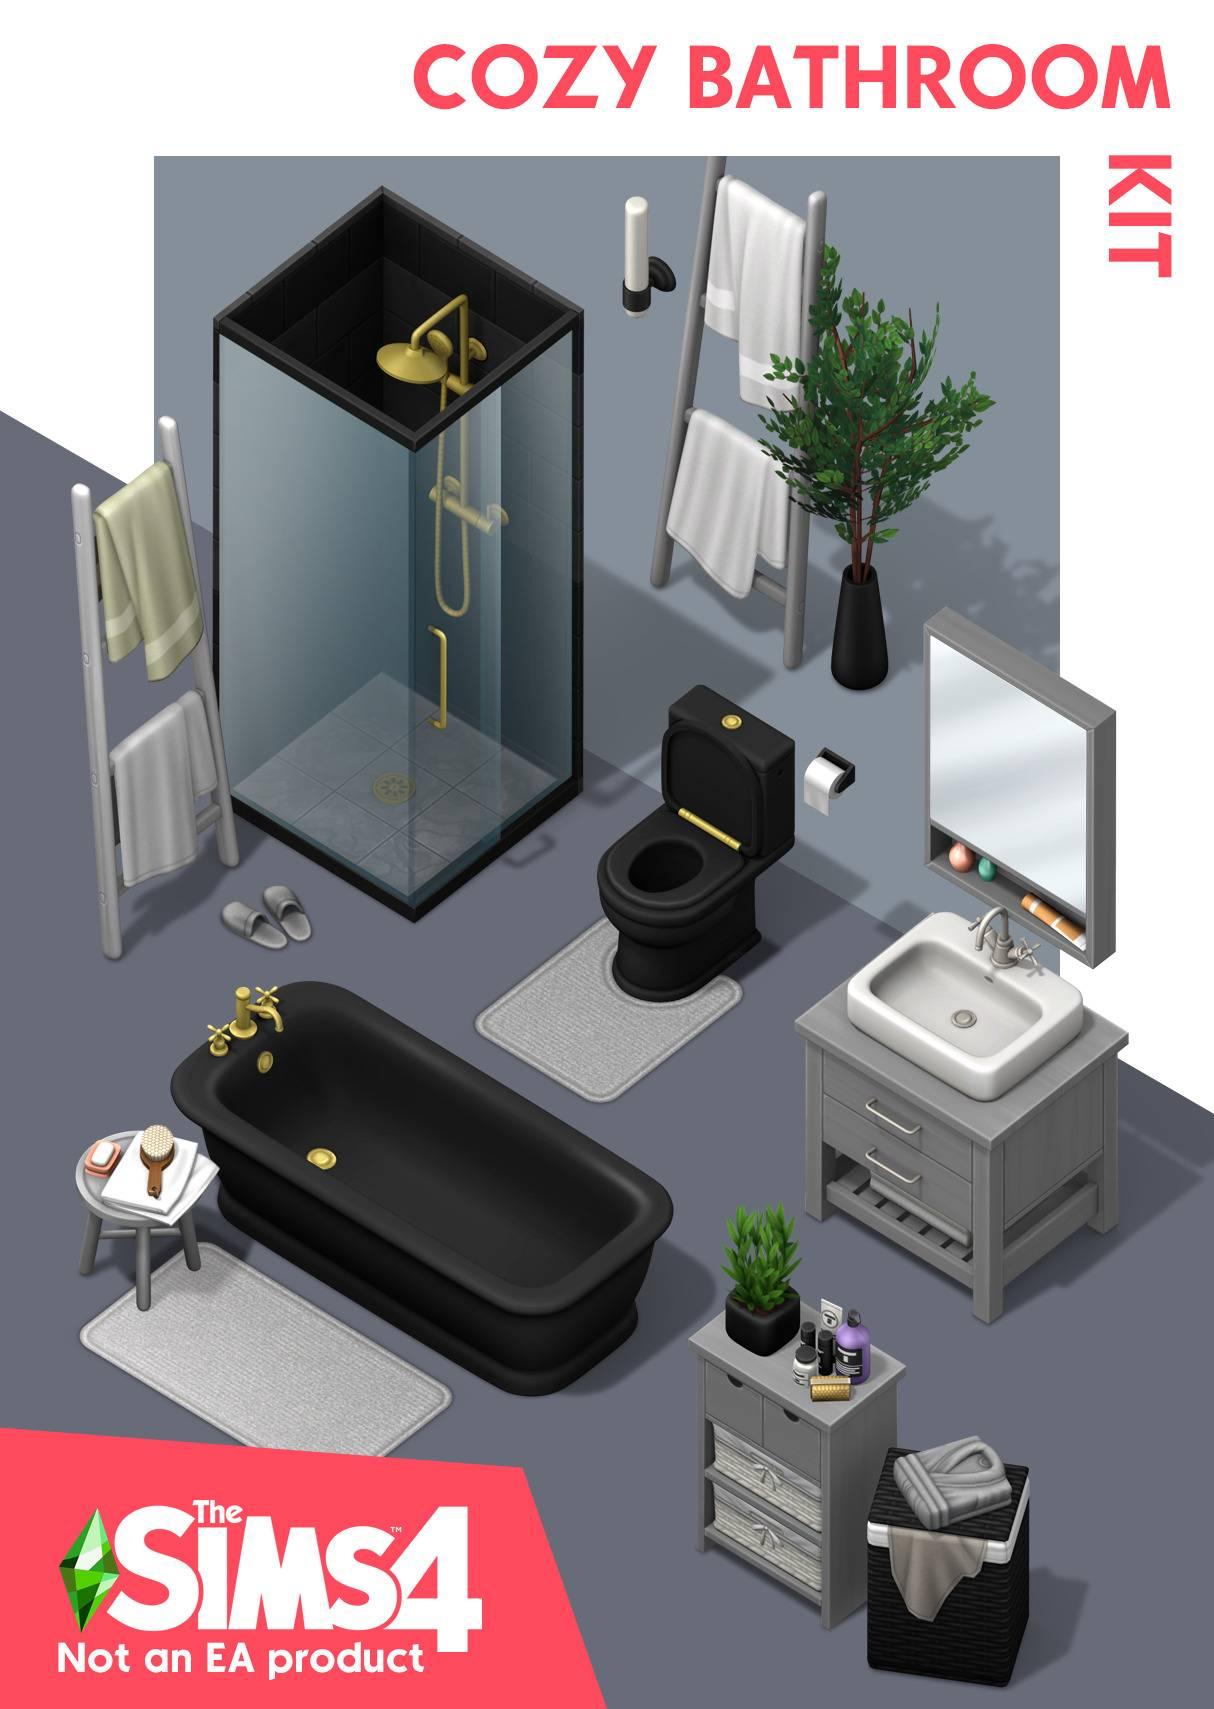 Комплект для ванной комнаты - Cozy Bathroom Kit